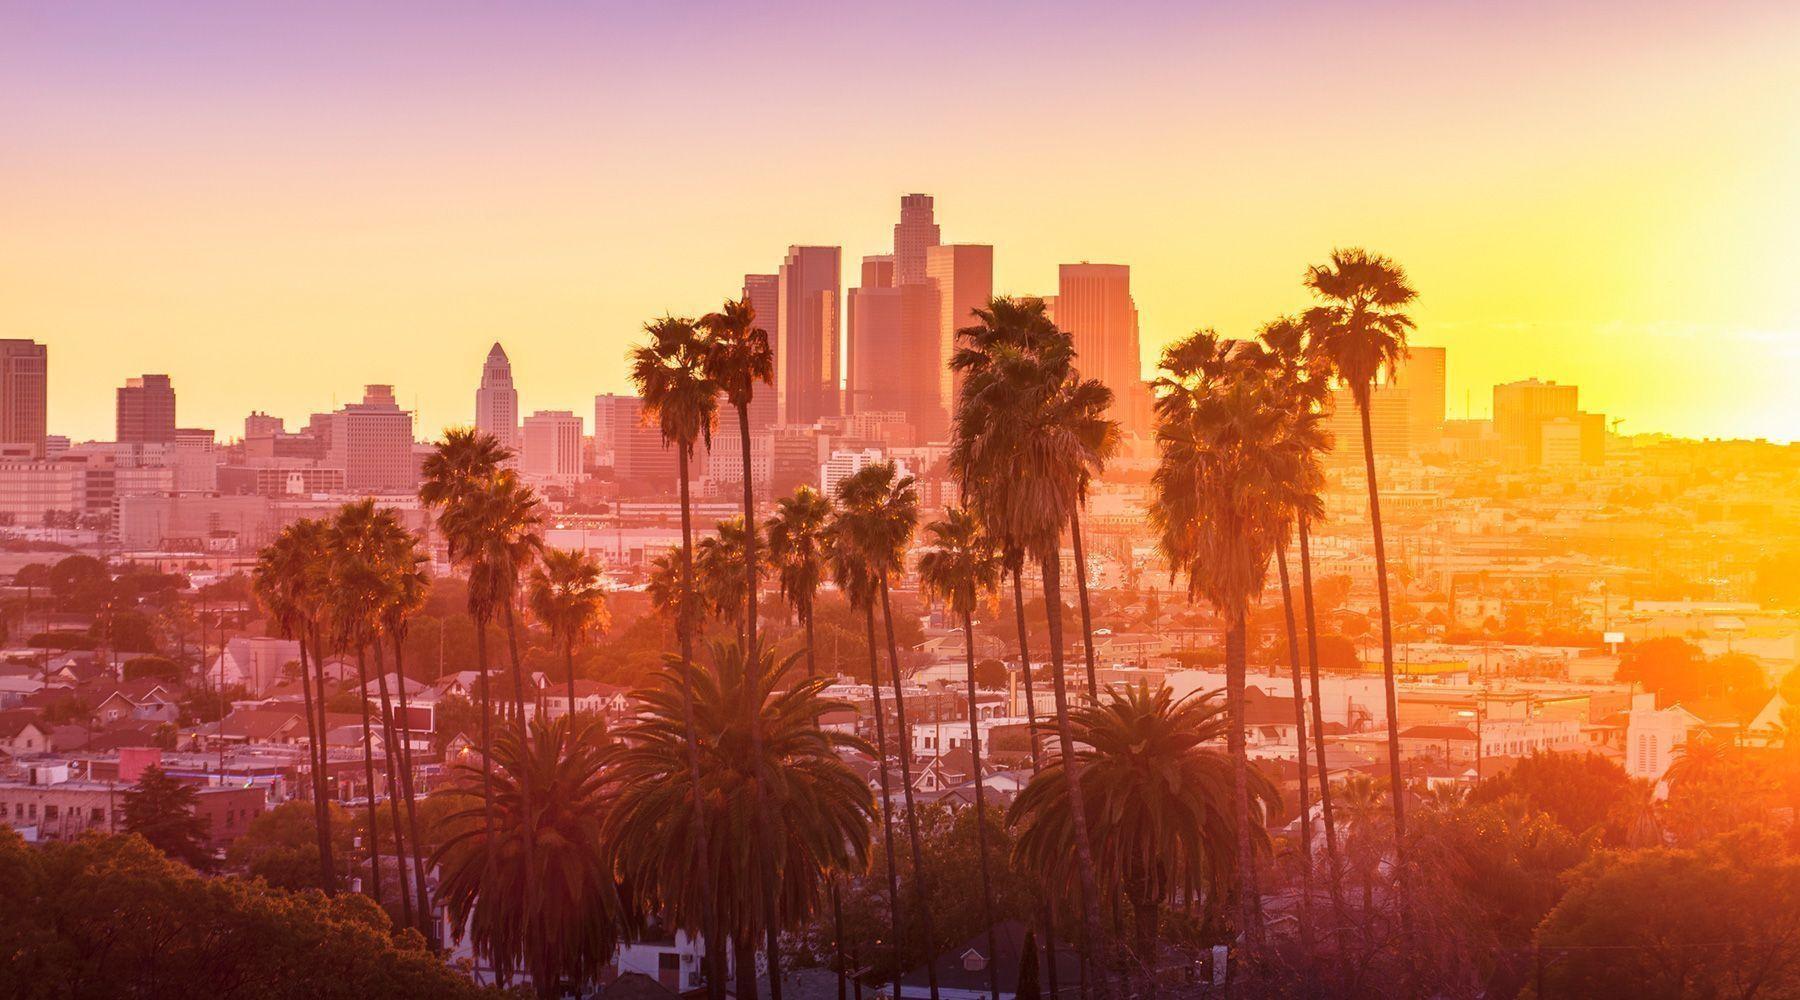 DU LỊCH BỜ TÂY MỸ 9N8D: LOS ANGELES - LAS VEGAS - SANFRANCISCO